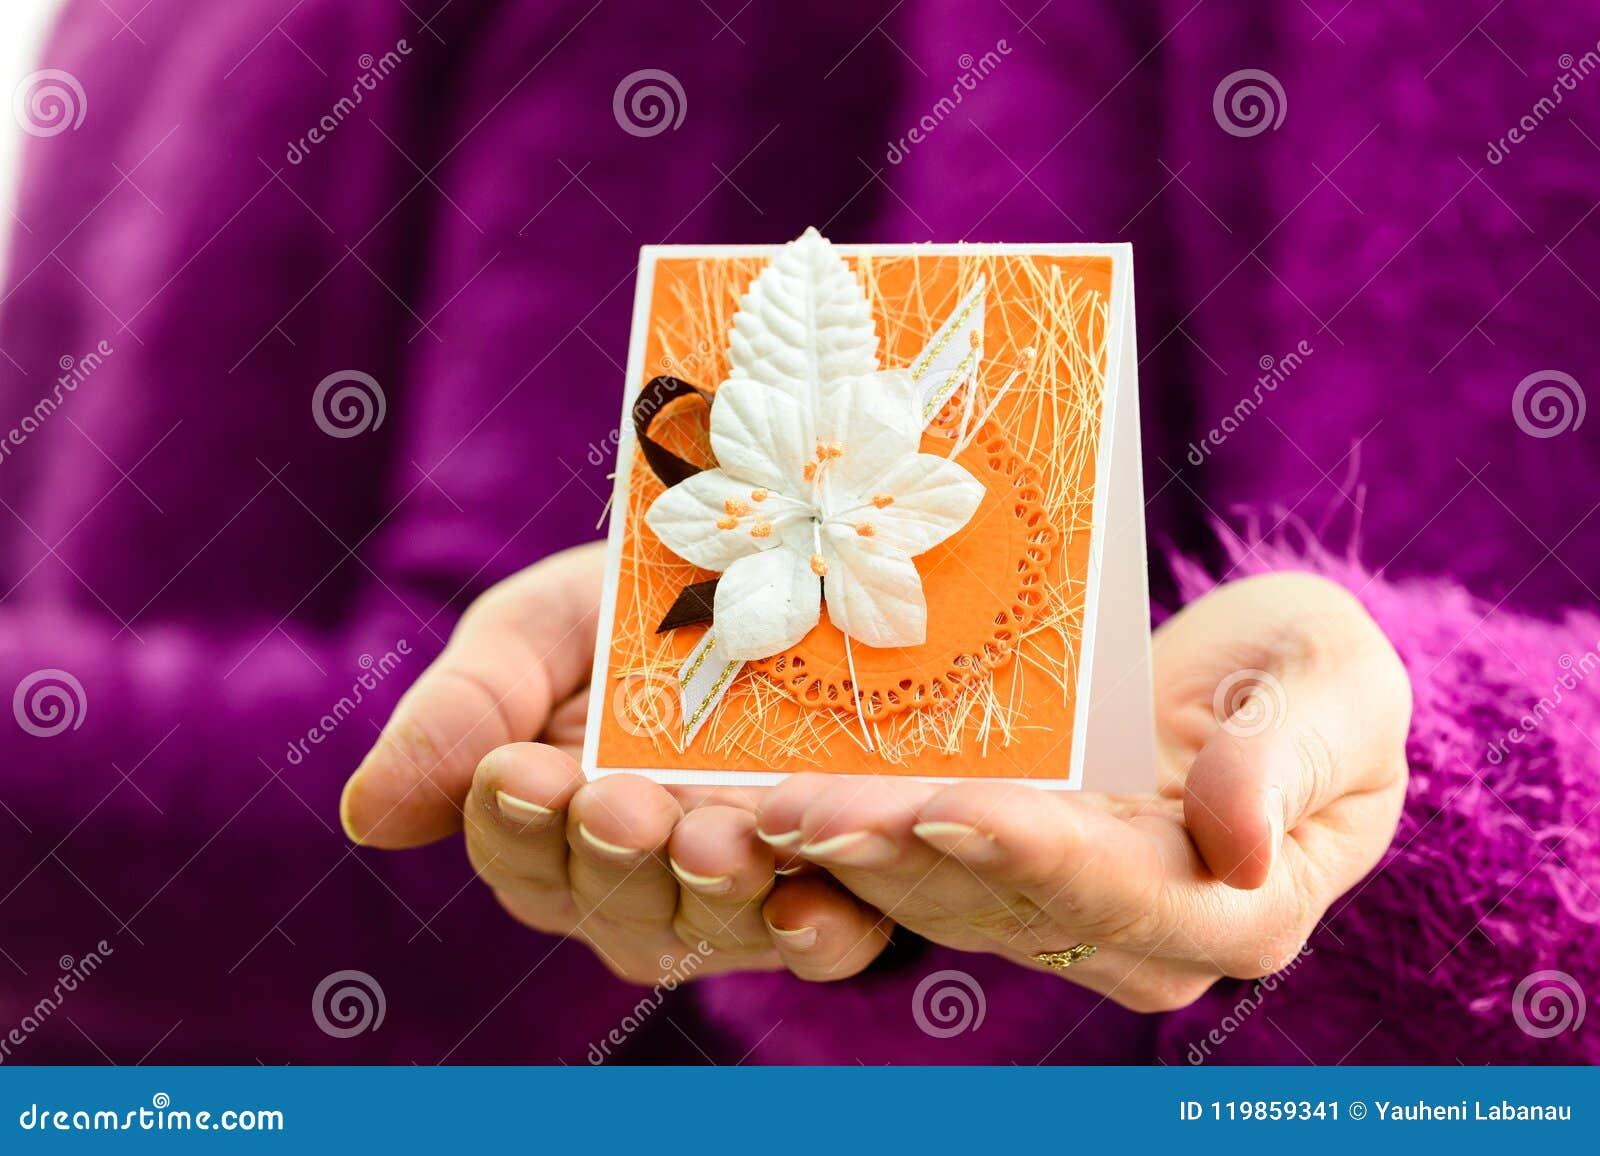 Handmade birthday card in woman hands